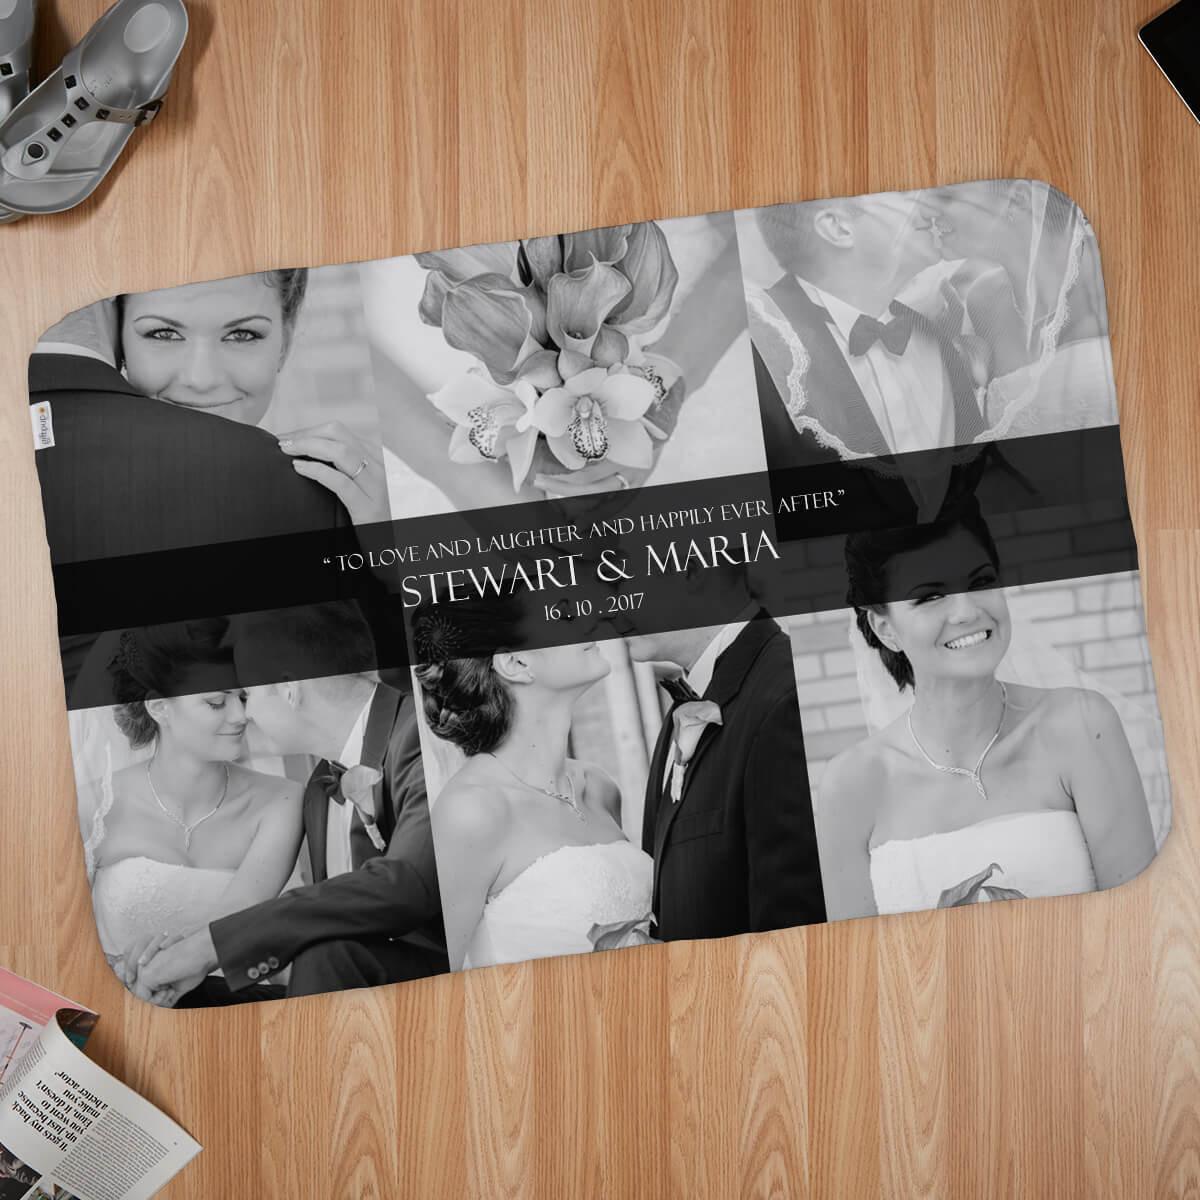 Wedding 6 Photo Collage Blanket